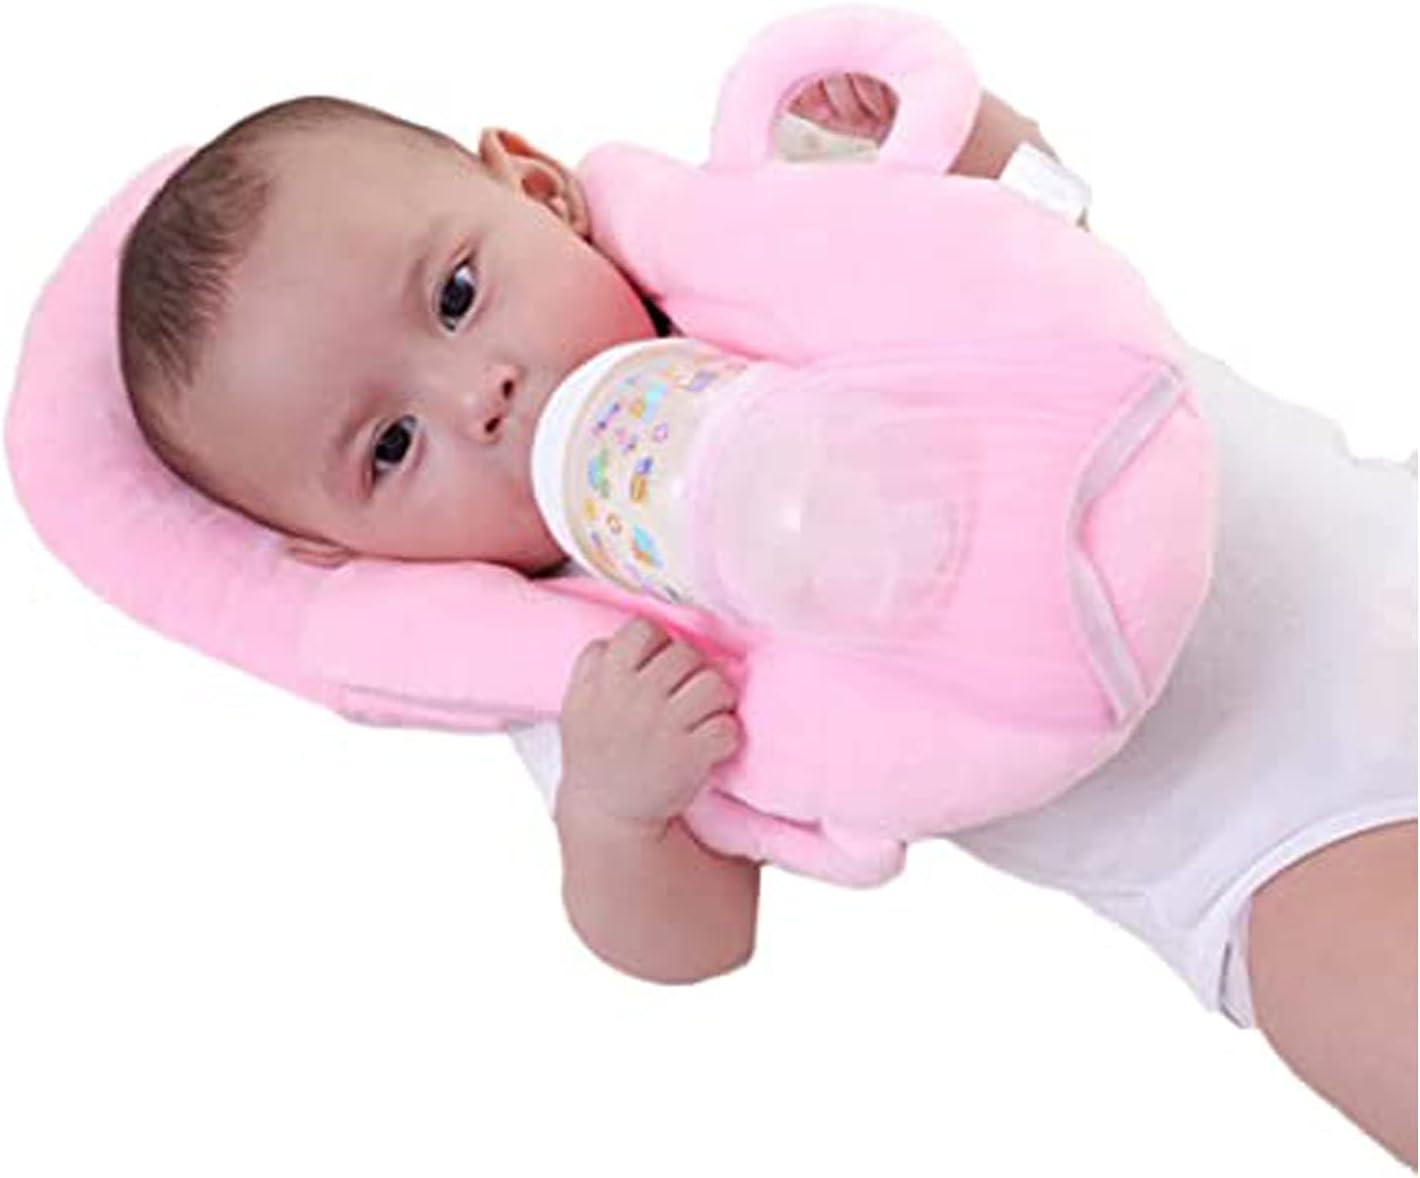 Newborn Babys Portable Detachable Feeding Pillows Self-Feeding Support Babys Cushion Pillow (A-Pink)